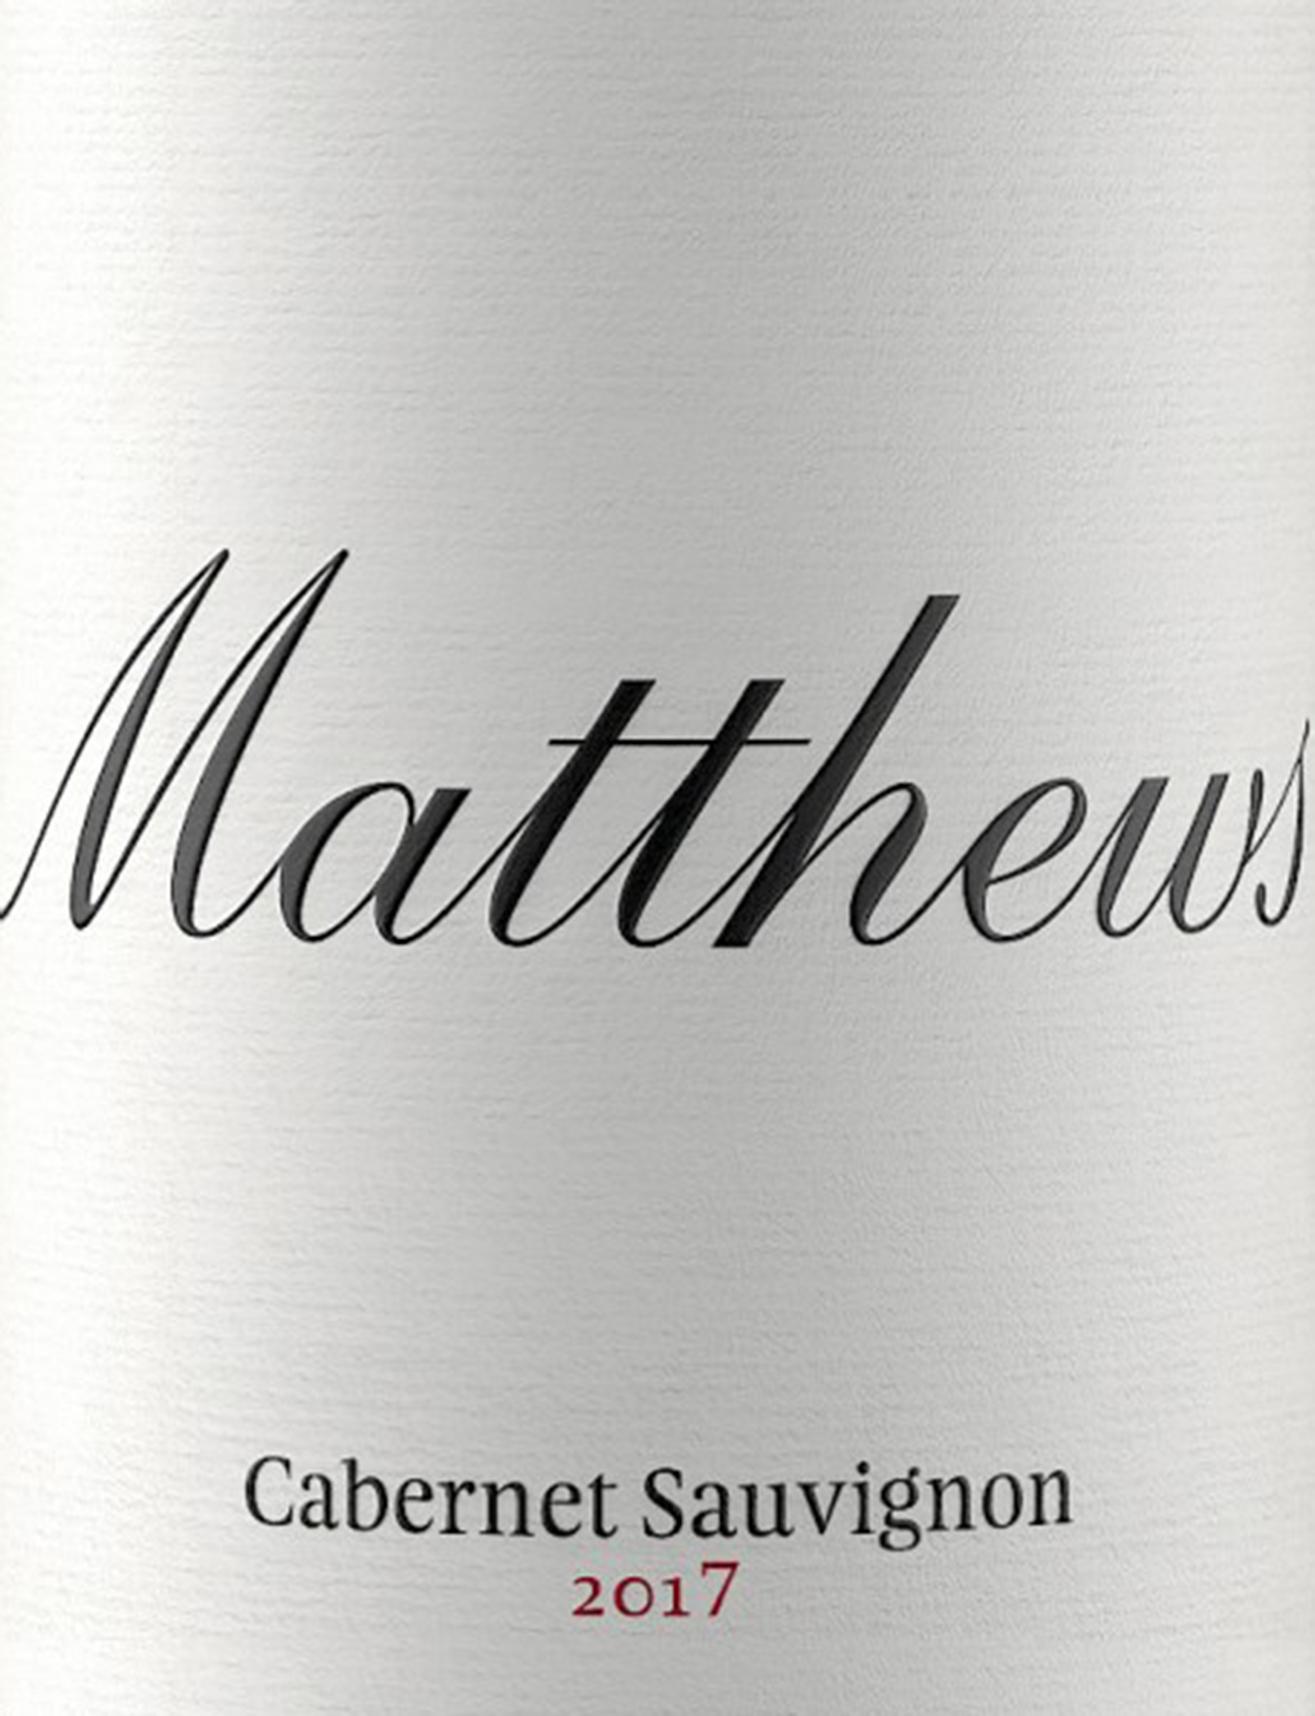 Matthews Cabernet Sauvignon (2017)